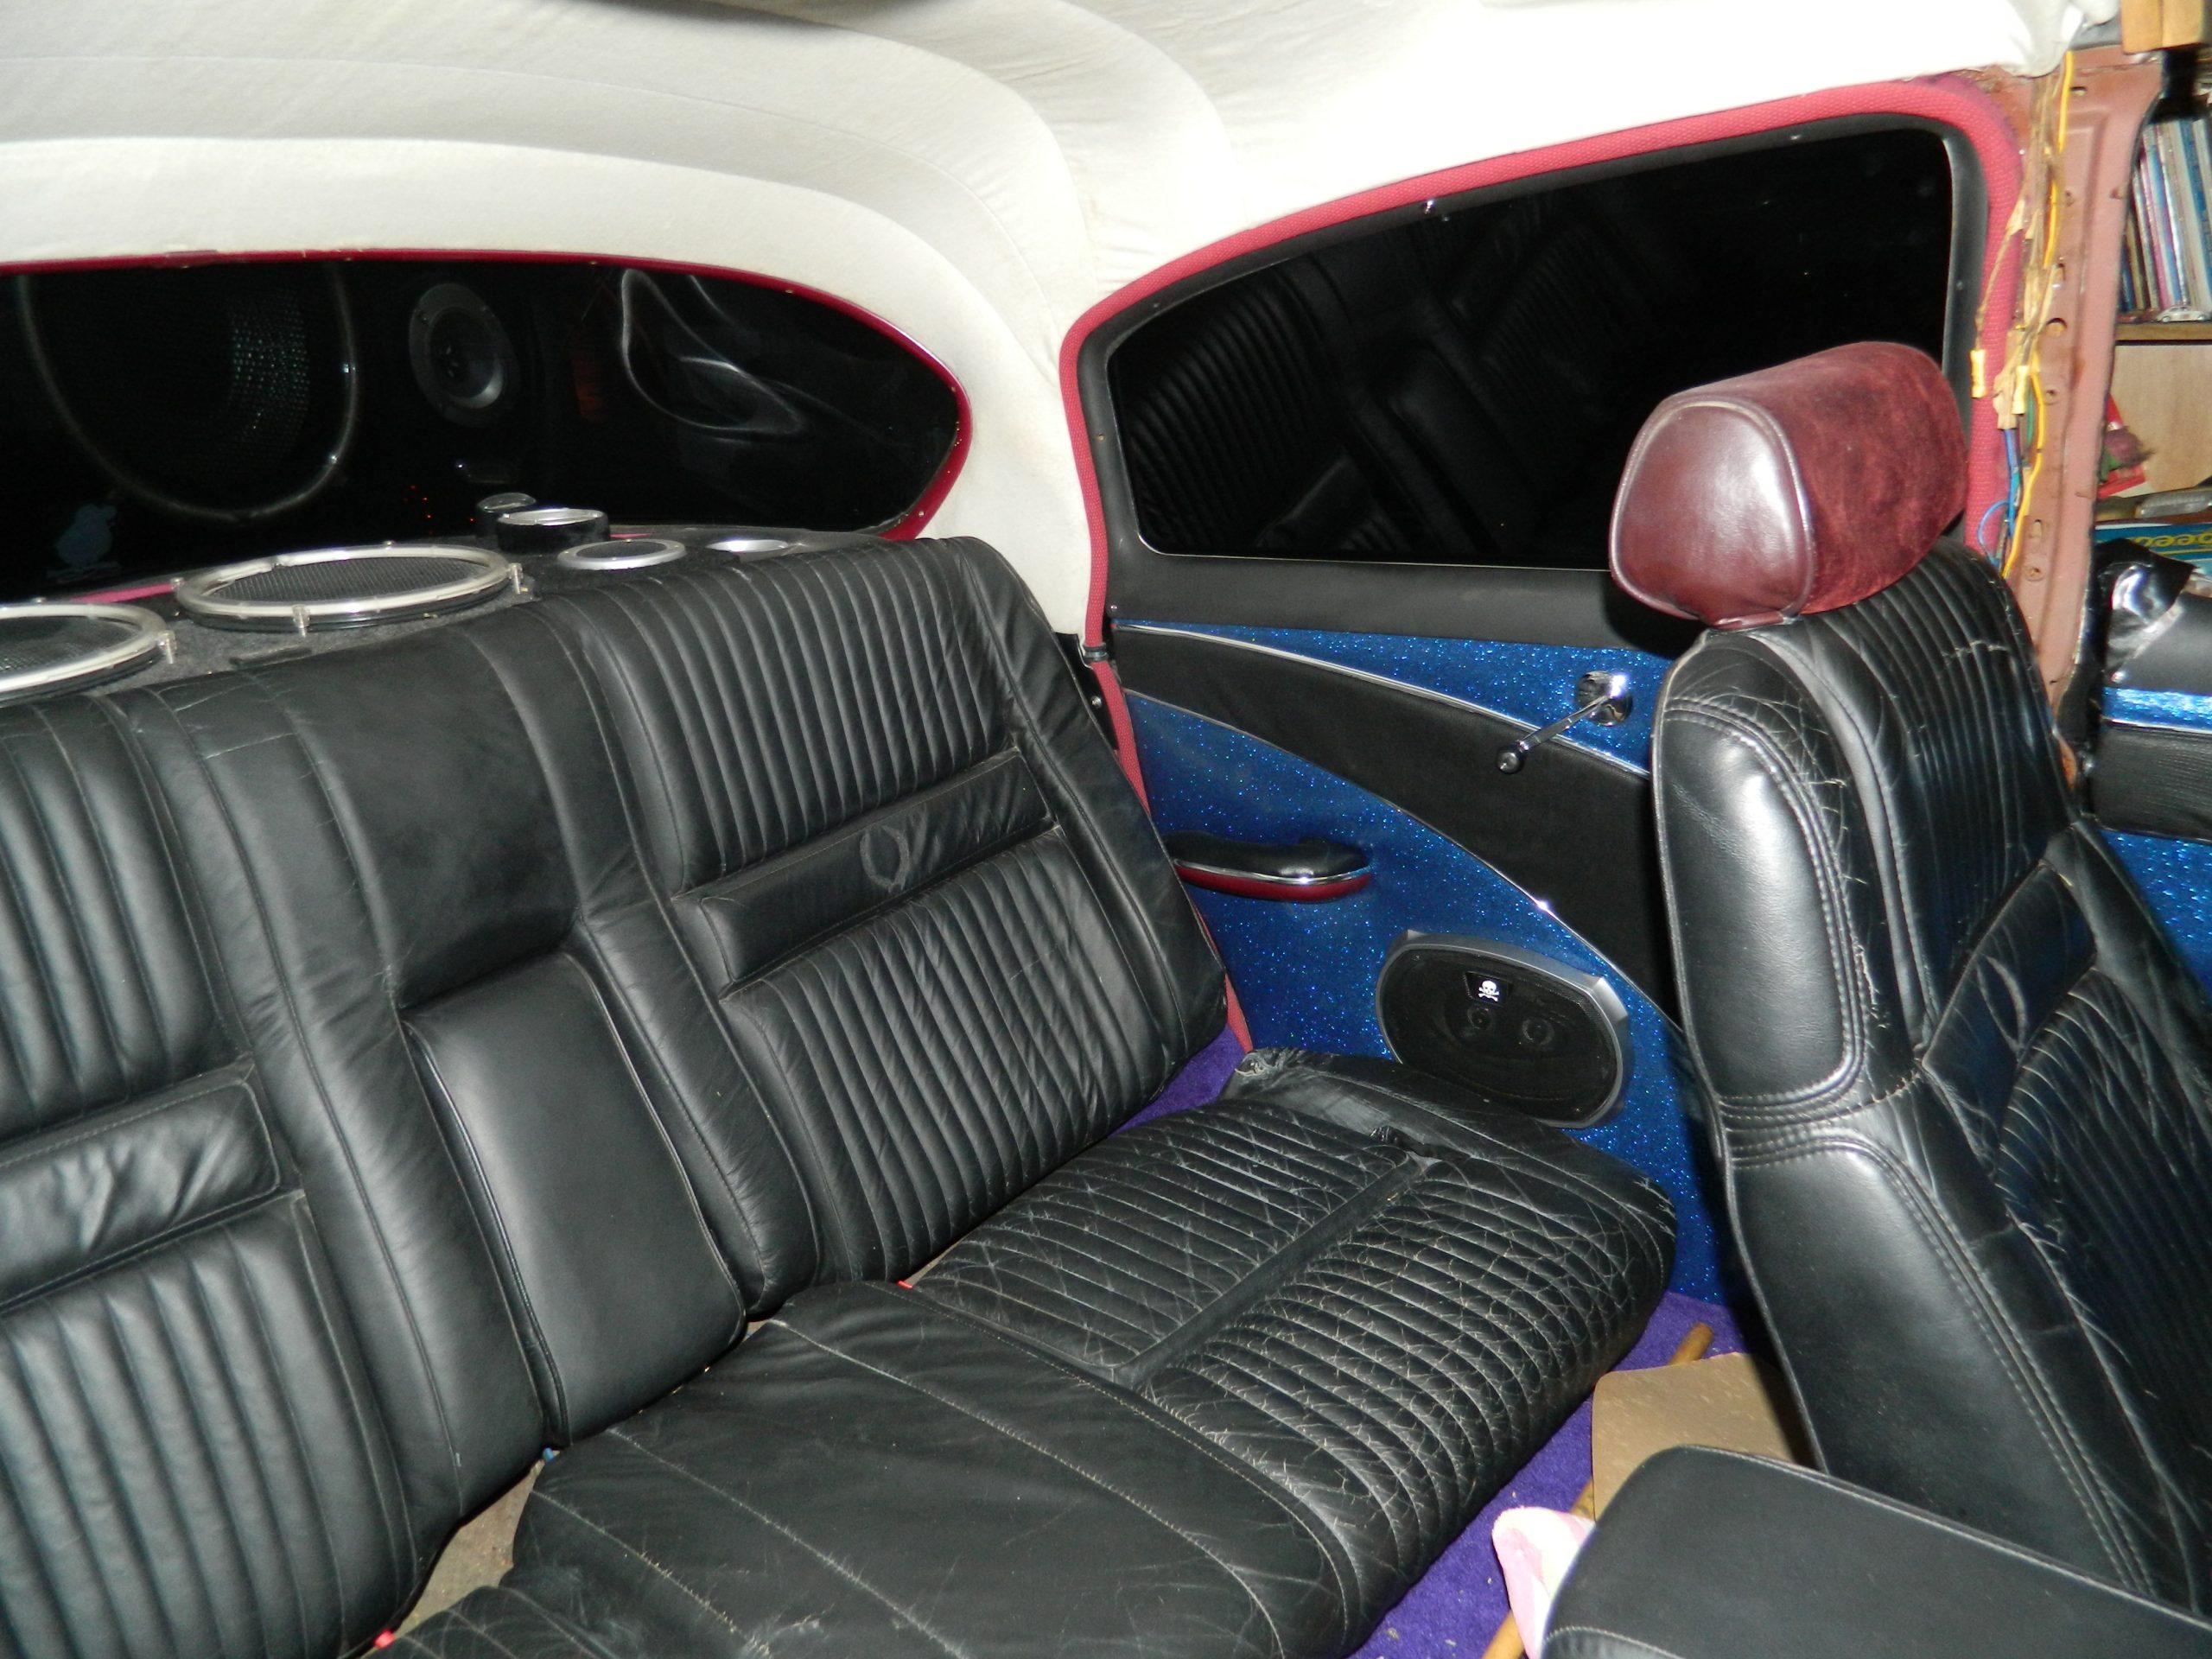 53-Chevy-interior-2012-1